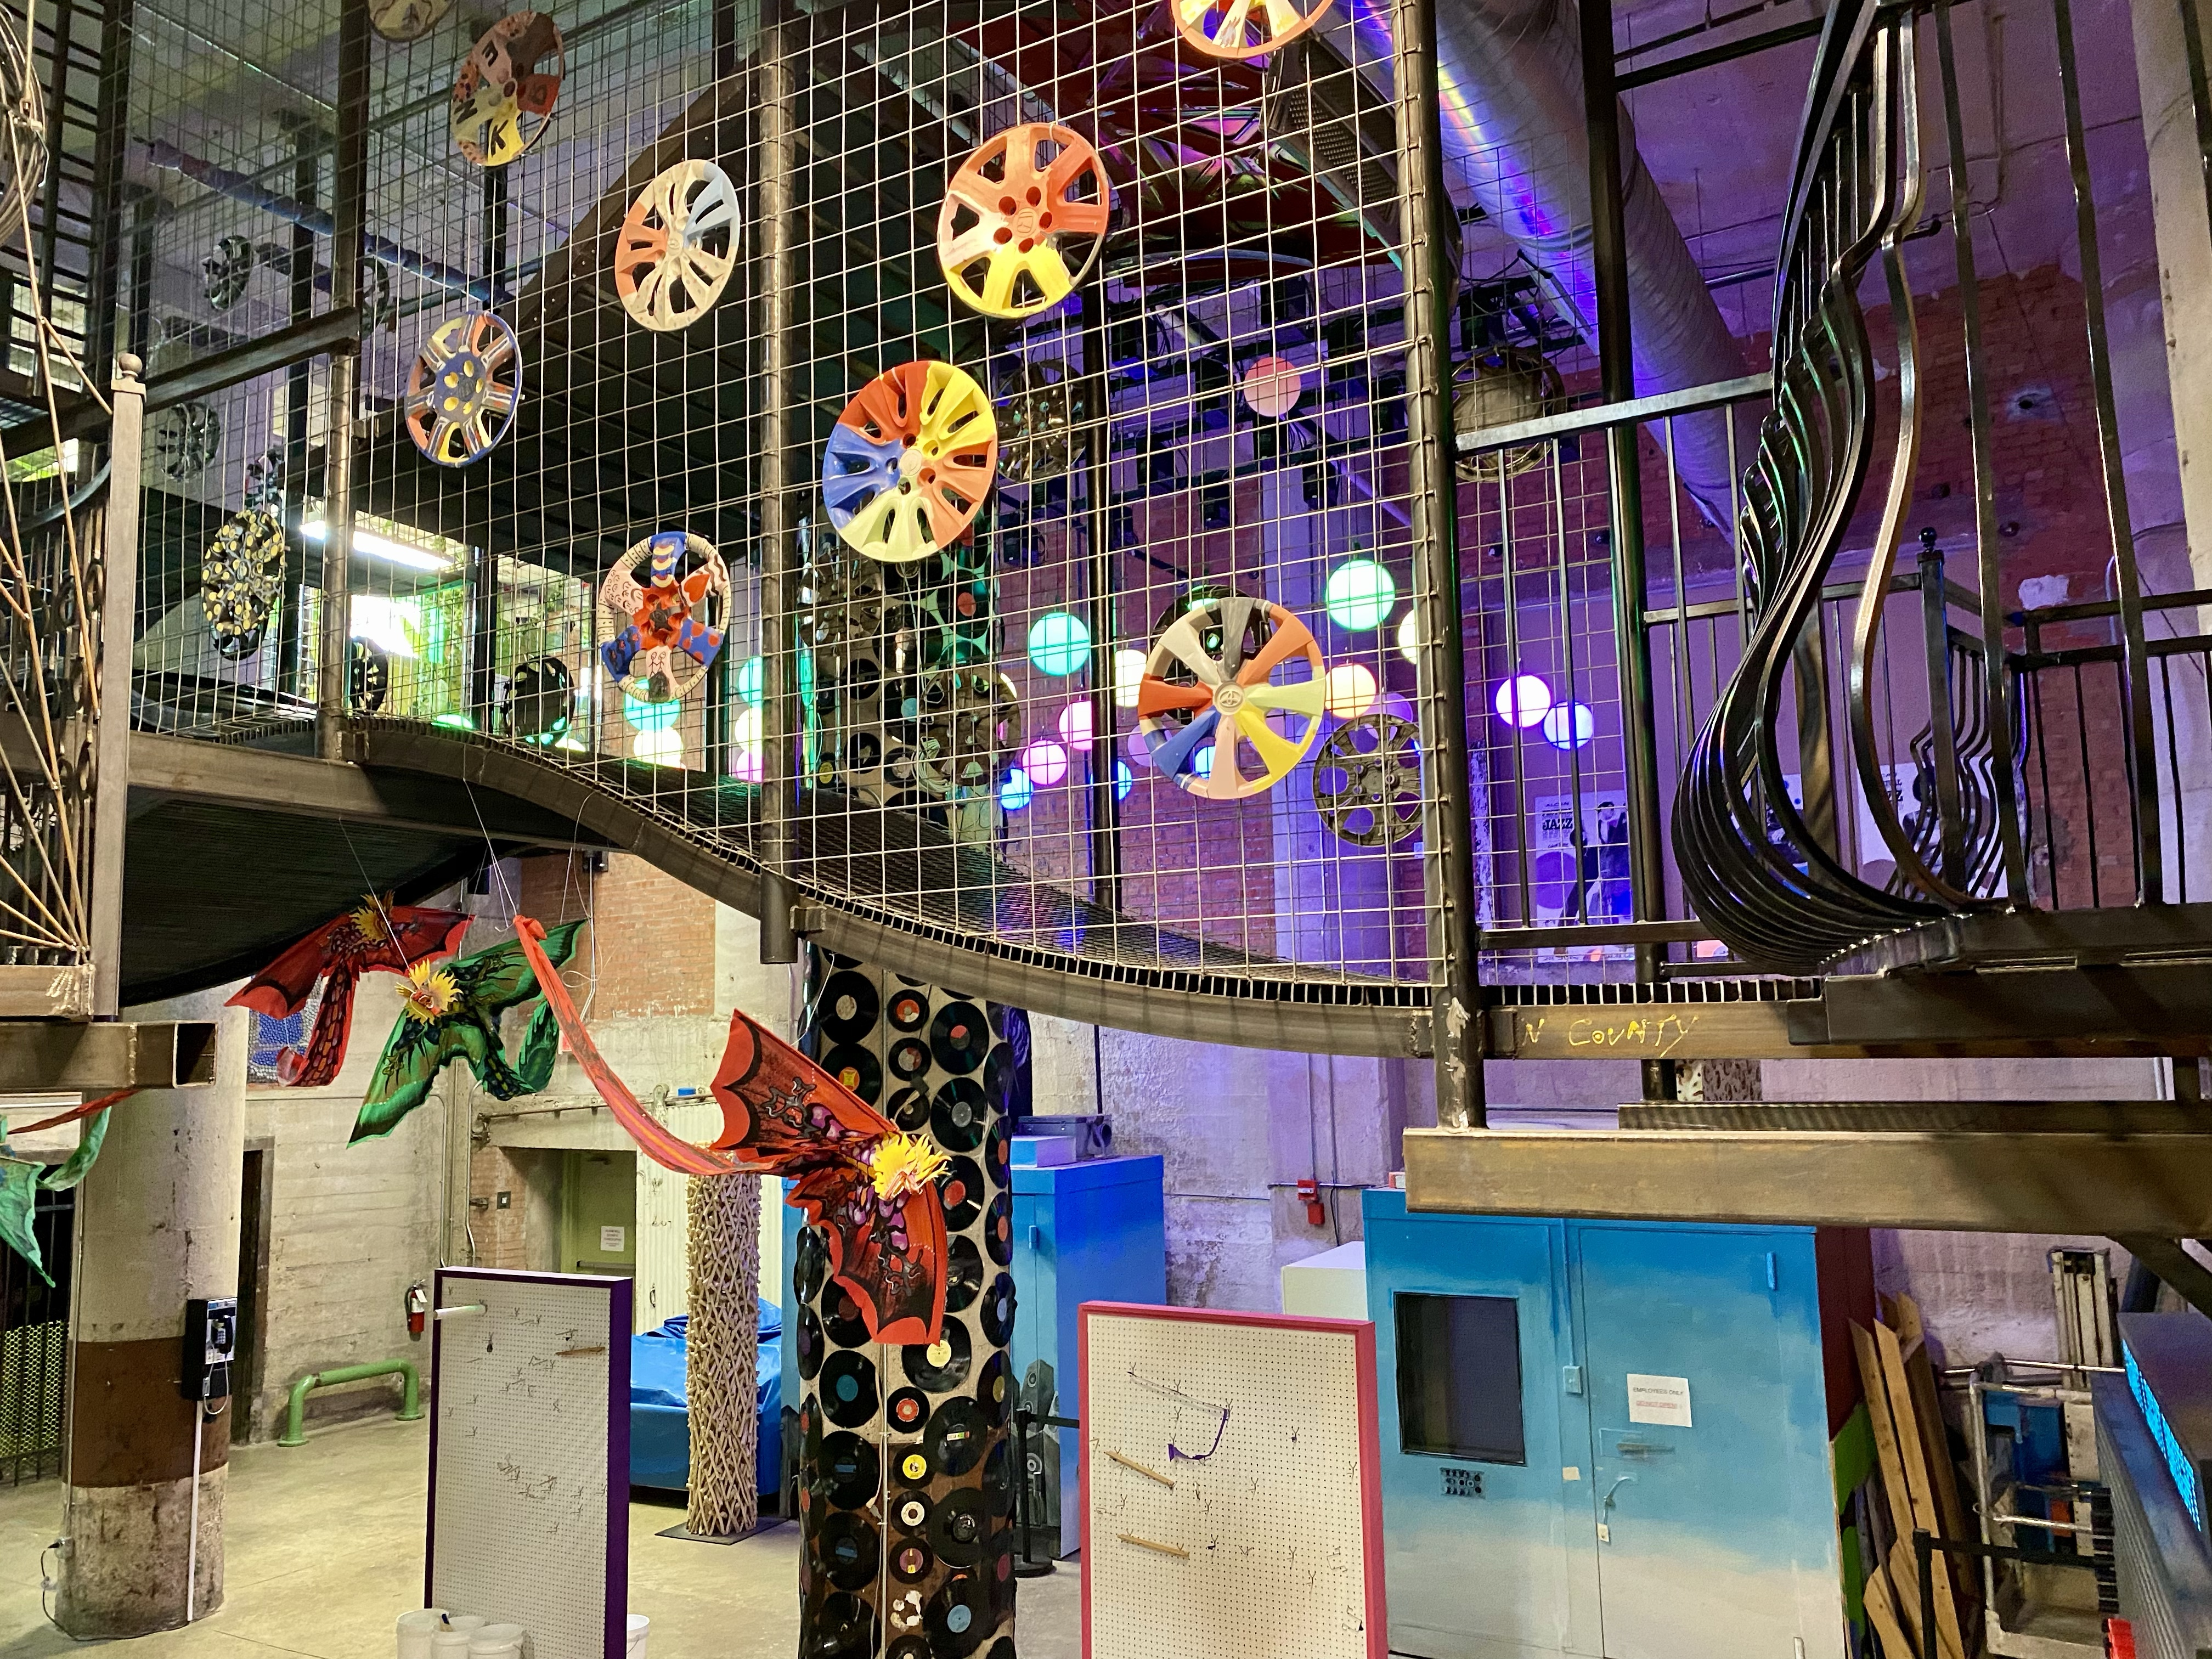 Spark Children's Museum in Dallas Texas